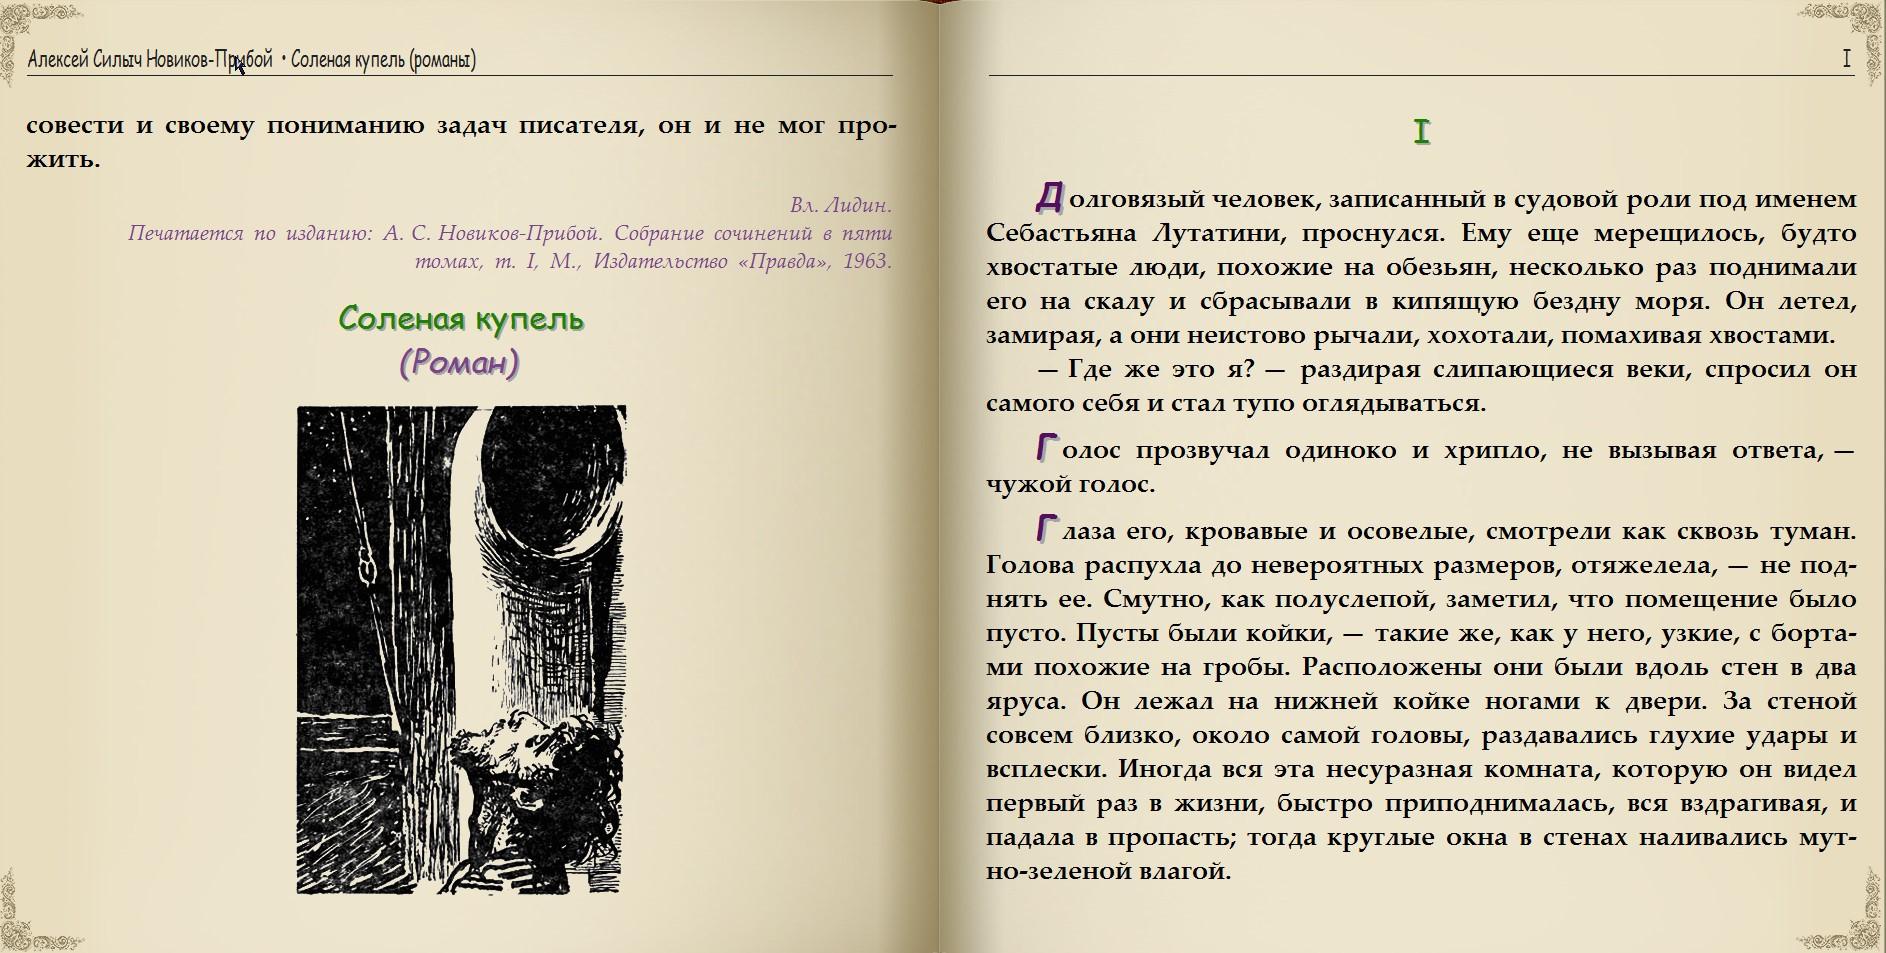 http://www.imageup.ru/img255/2250180/d4.jpg